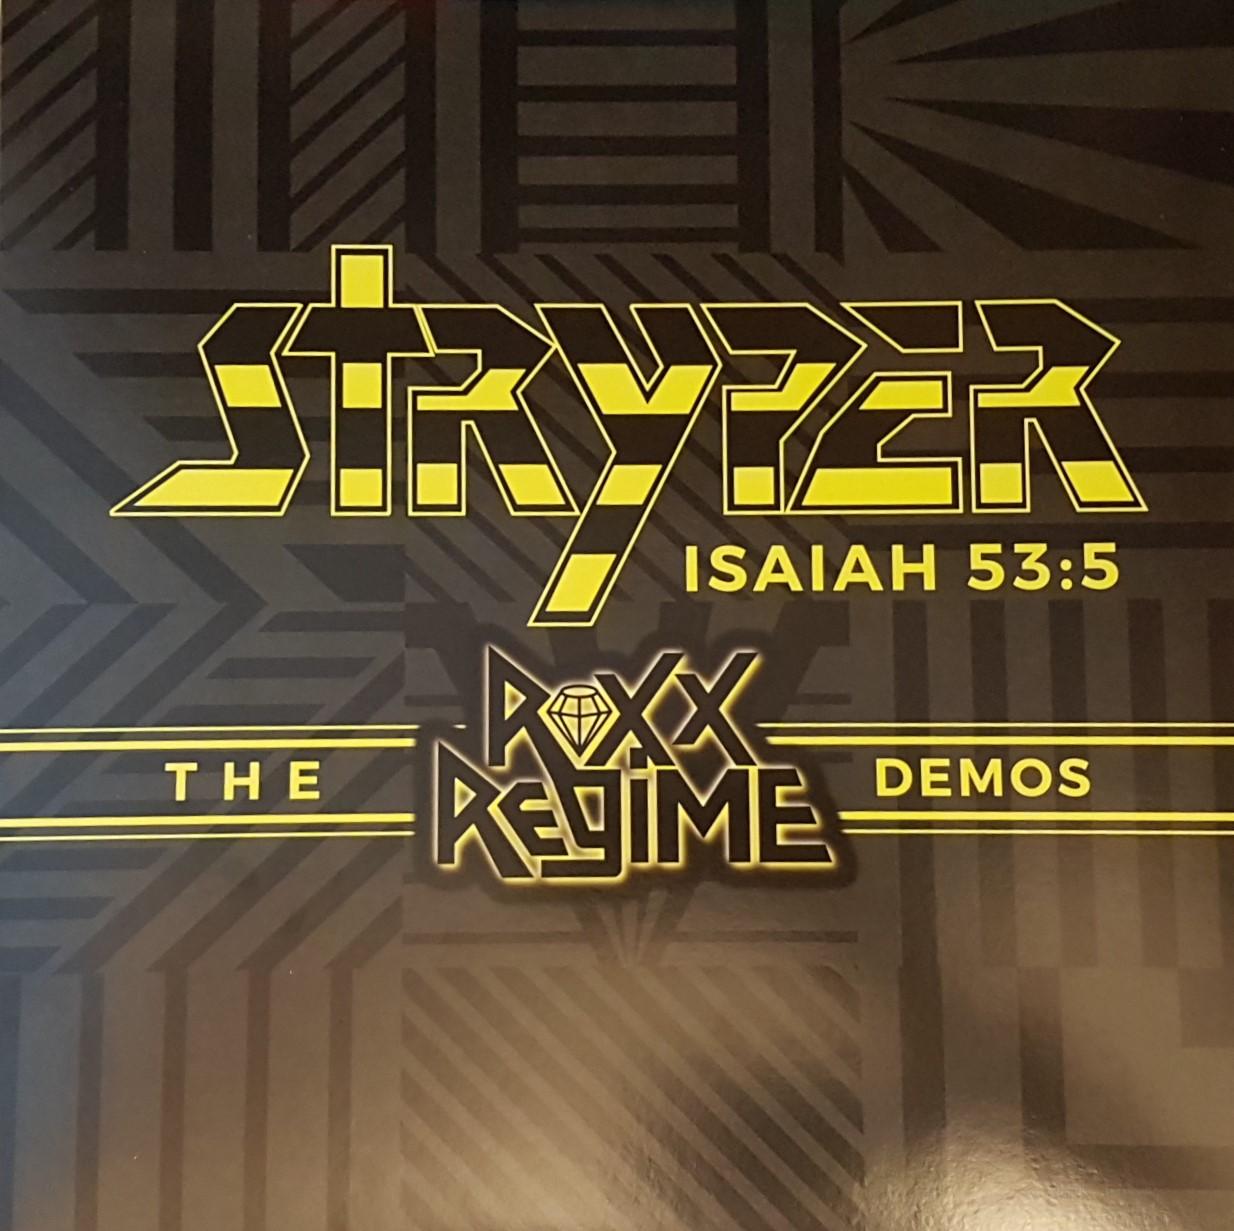 REVIEW: Stryper – The Roxx Regime Demos (2007, 2019 vinyl